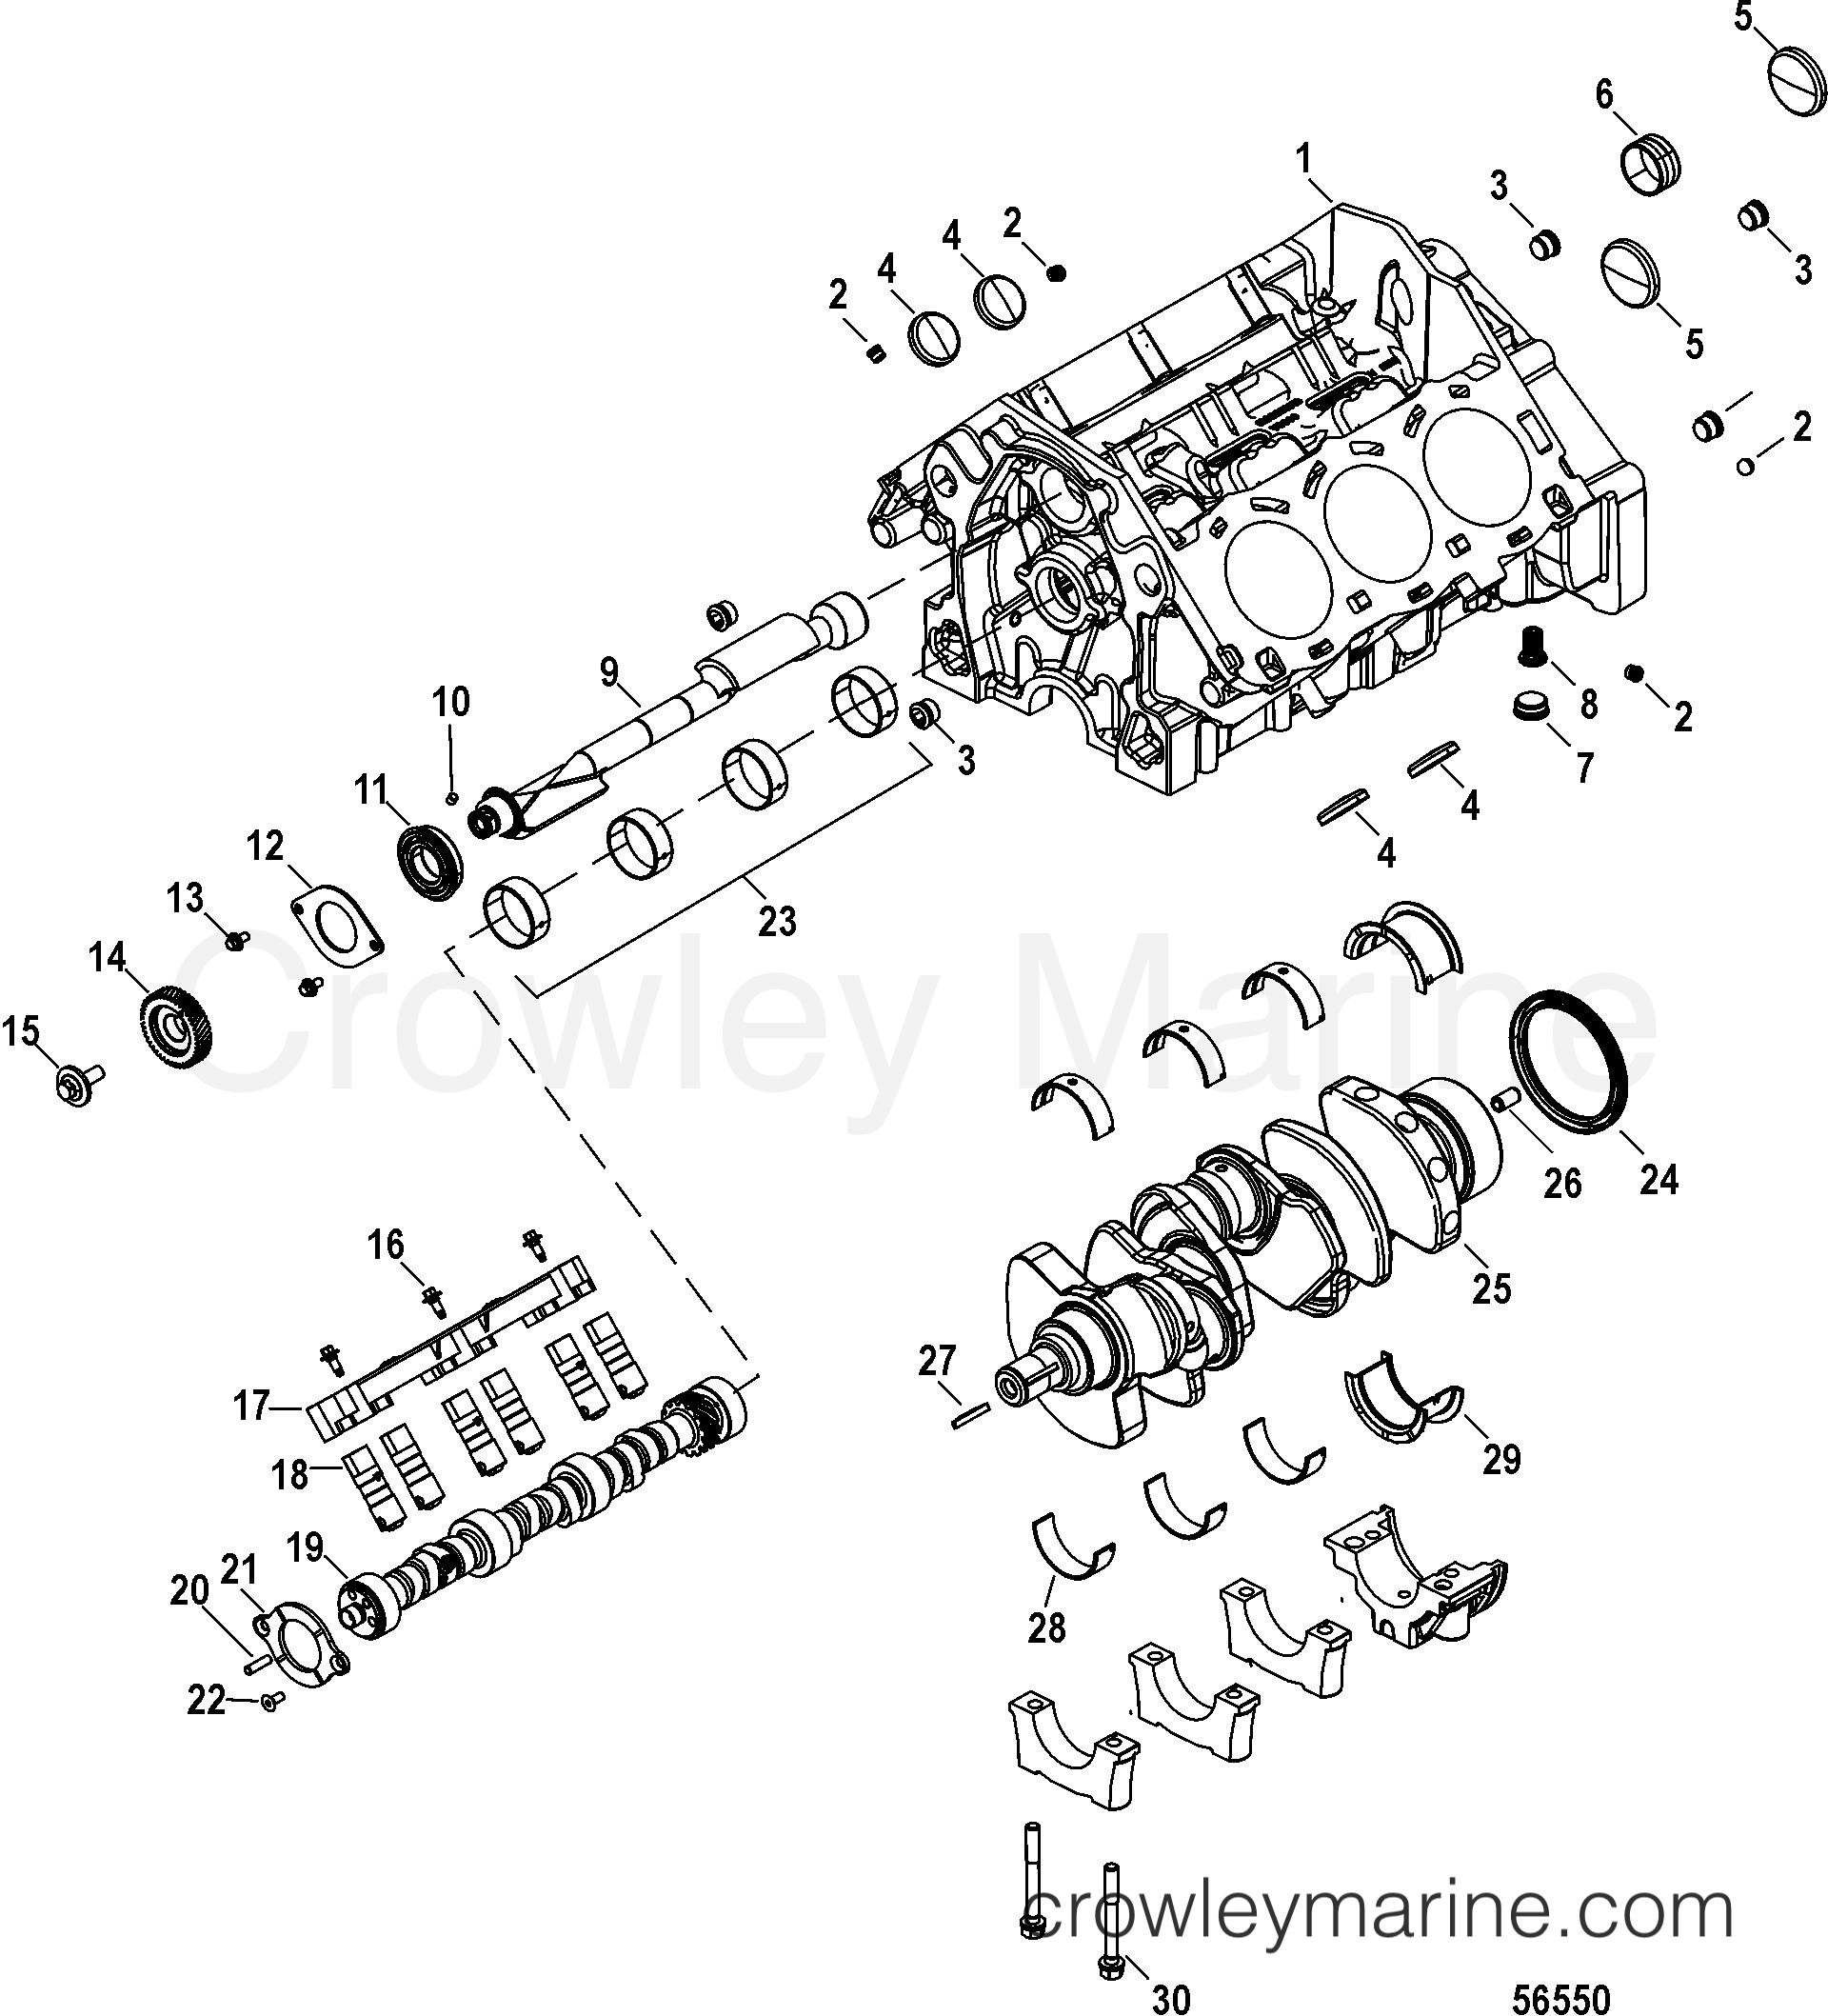 2014 Mercruiser 4.5L [BRAVO MPI] - 40450058A CYLINDER BLOCK, CAMSHAFT, CRANKSHAFT, AND BALANCESHAFT section